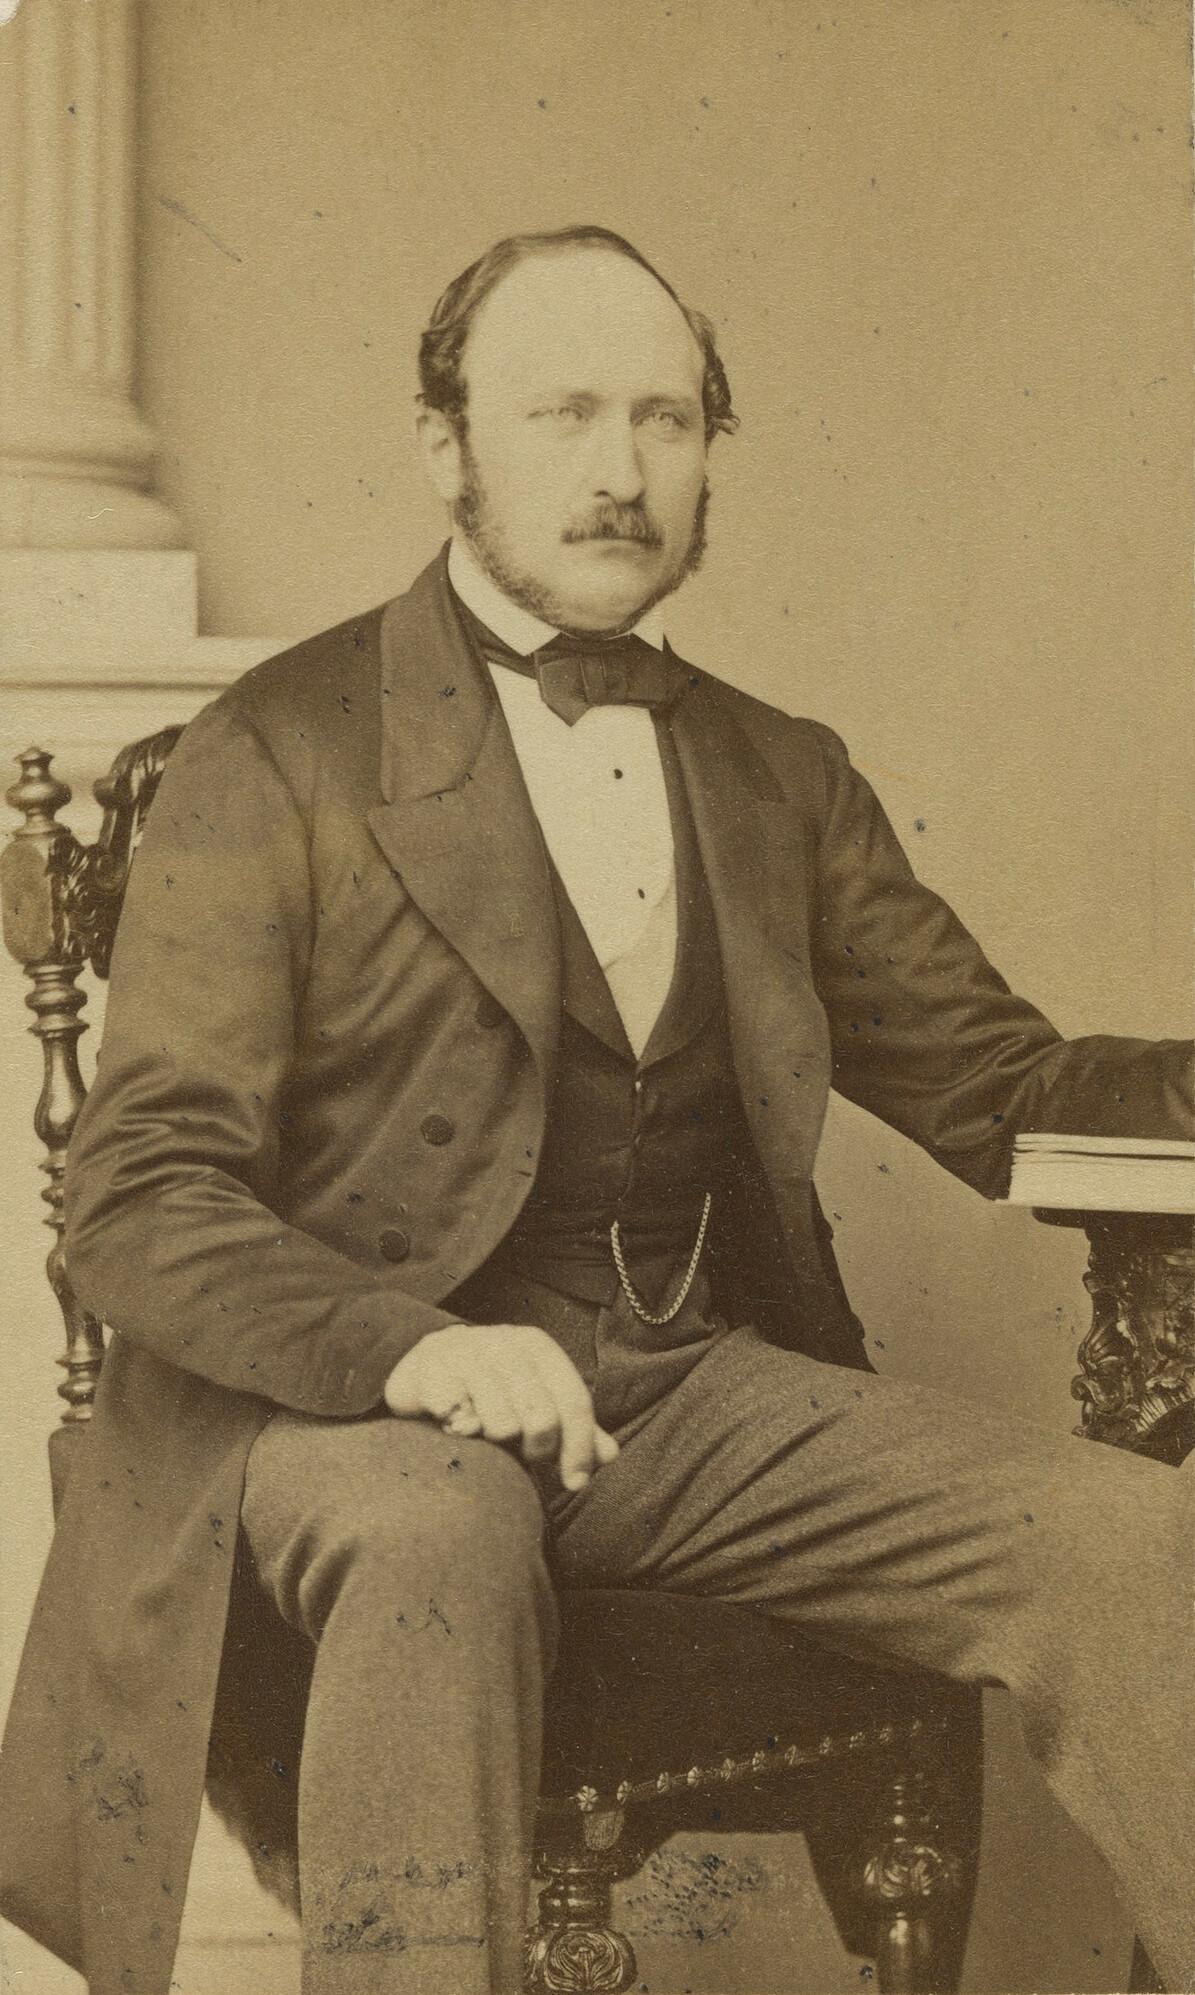 File:Prince Albert, Prince Consort of the United Kingdom